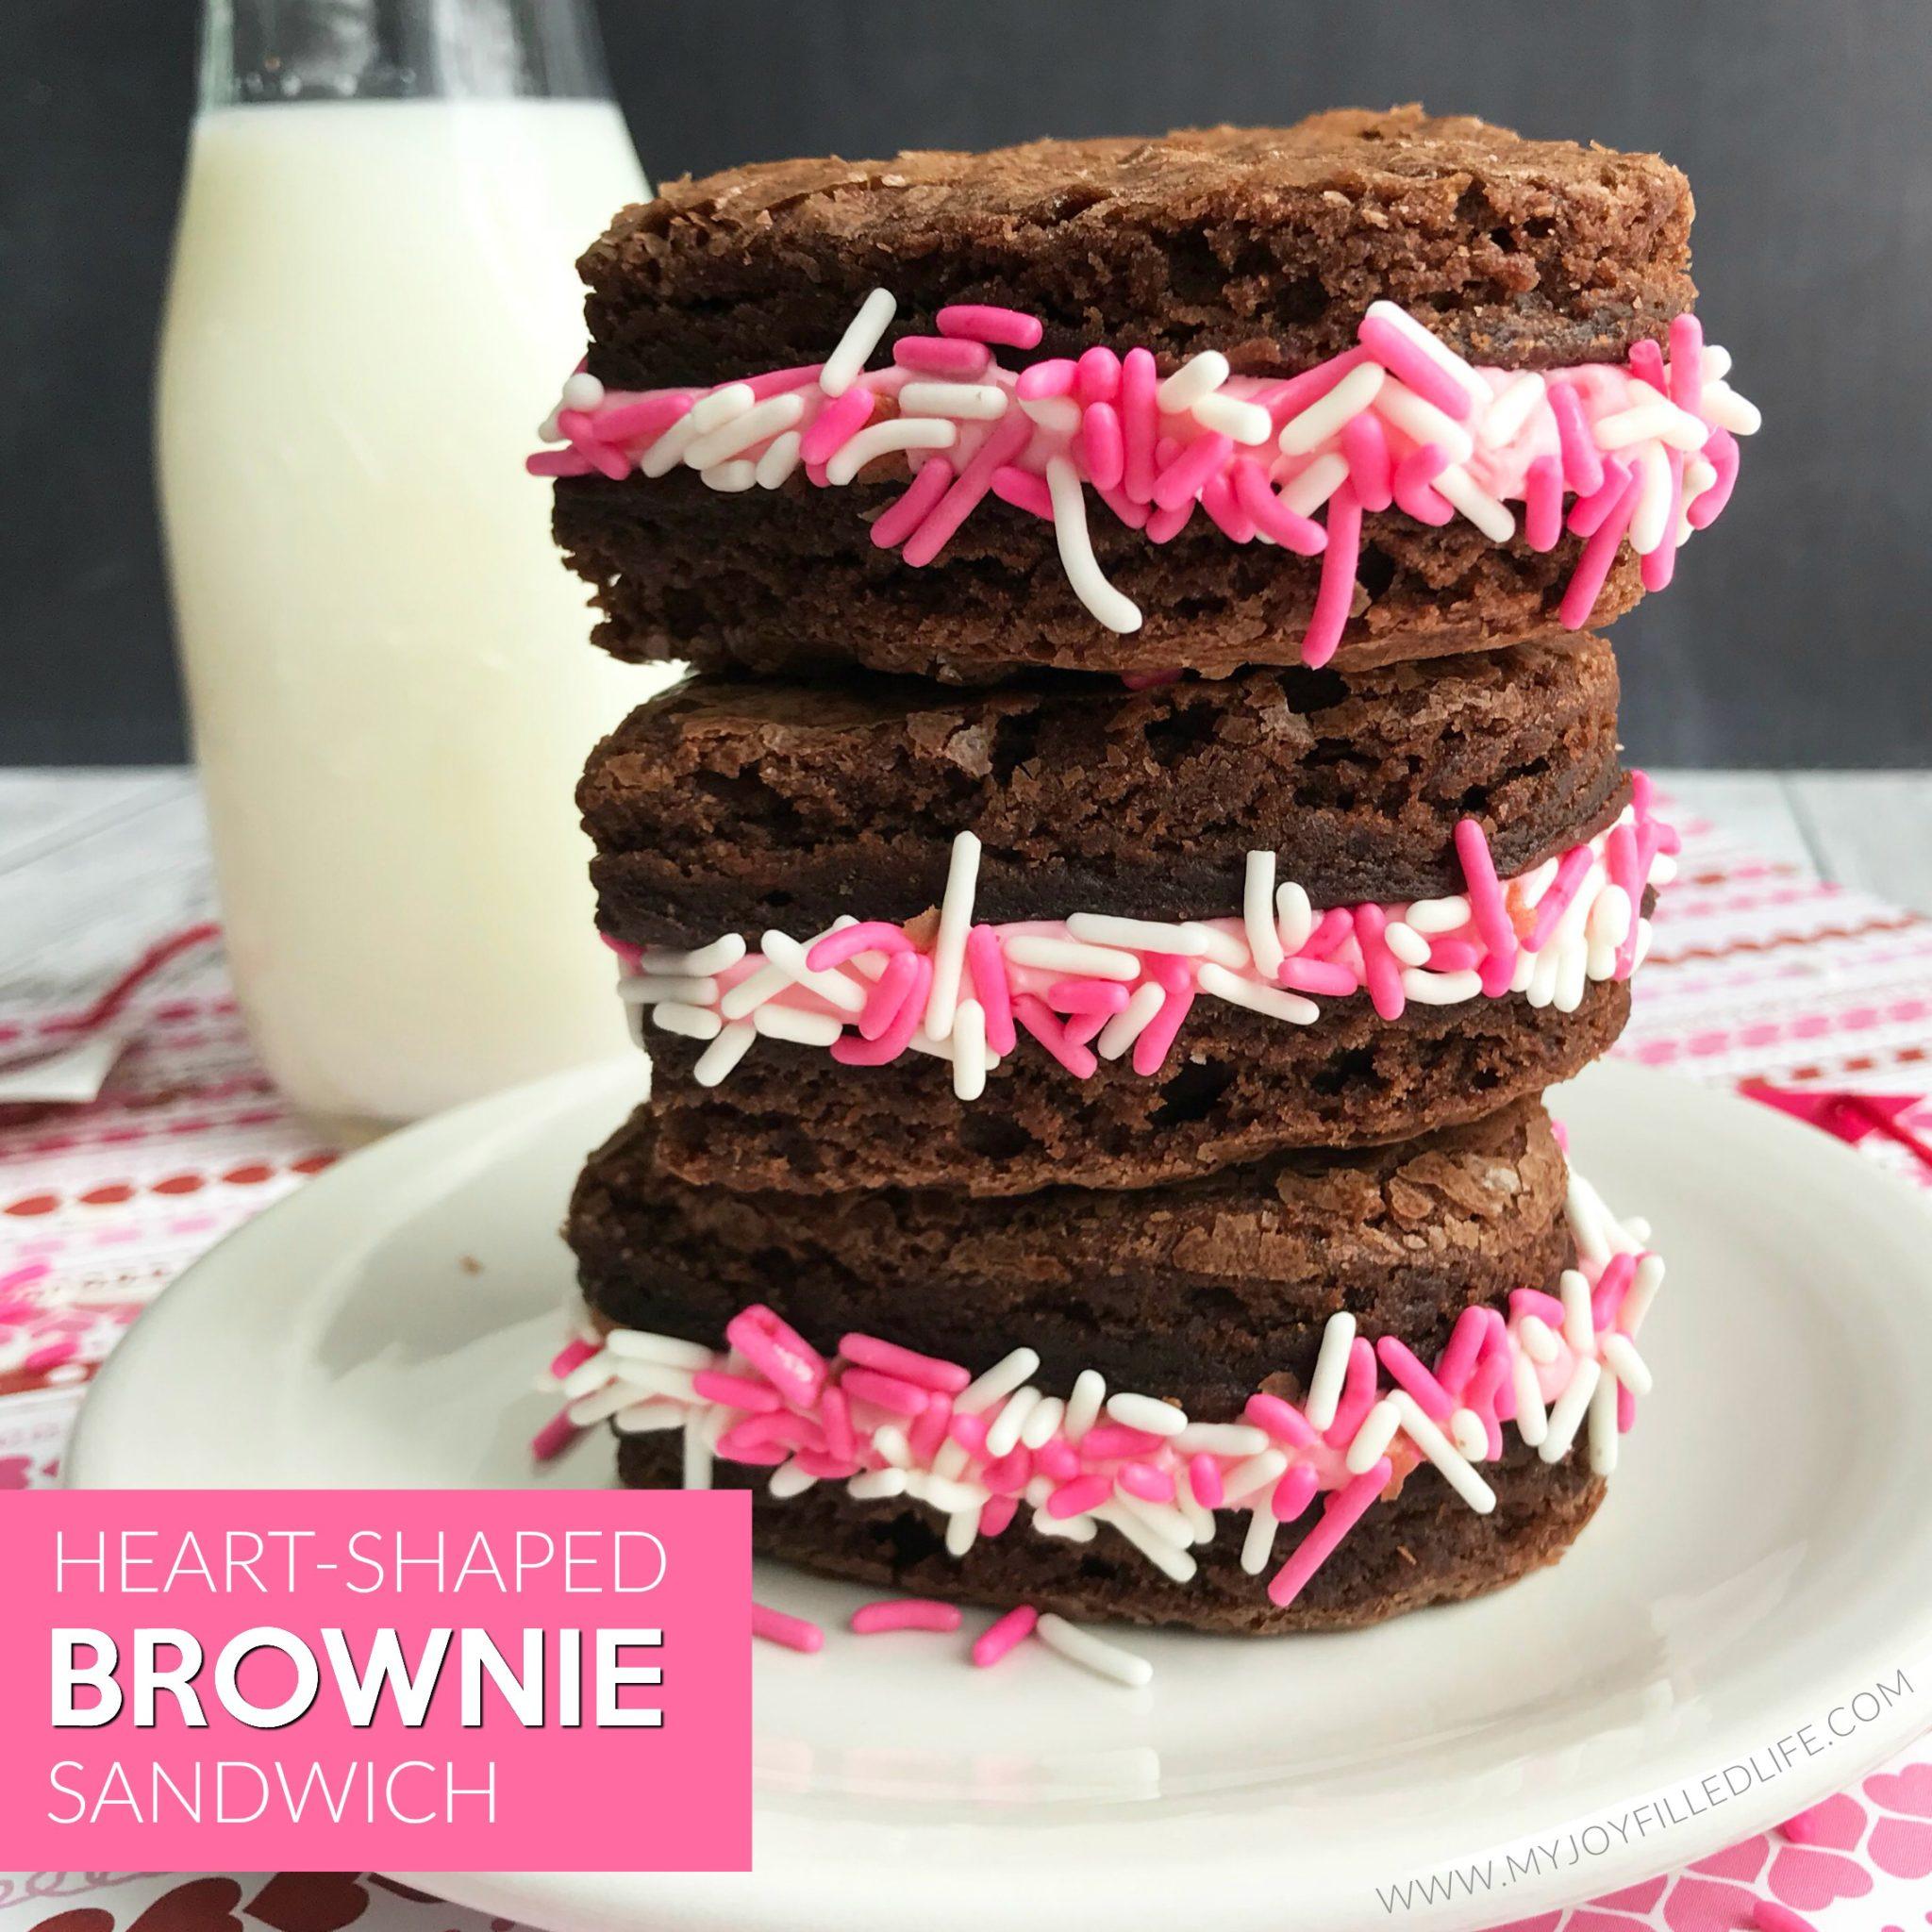 https://www.myjoyfilledlife.com/heart-shaped-brownie-sandwiches/